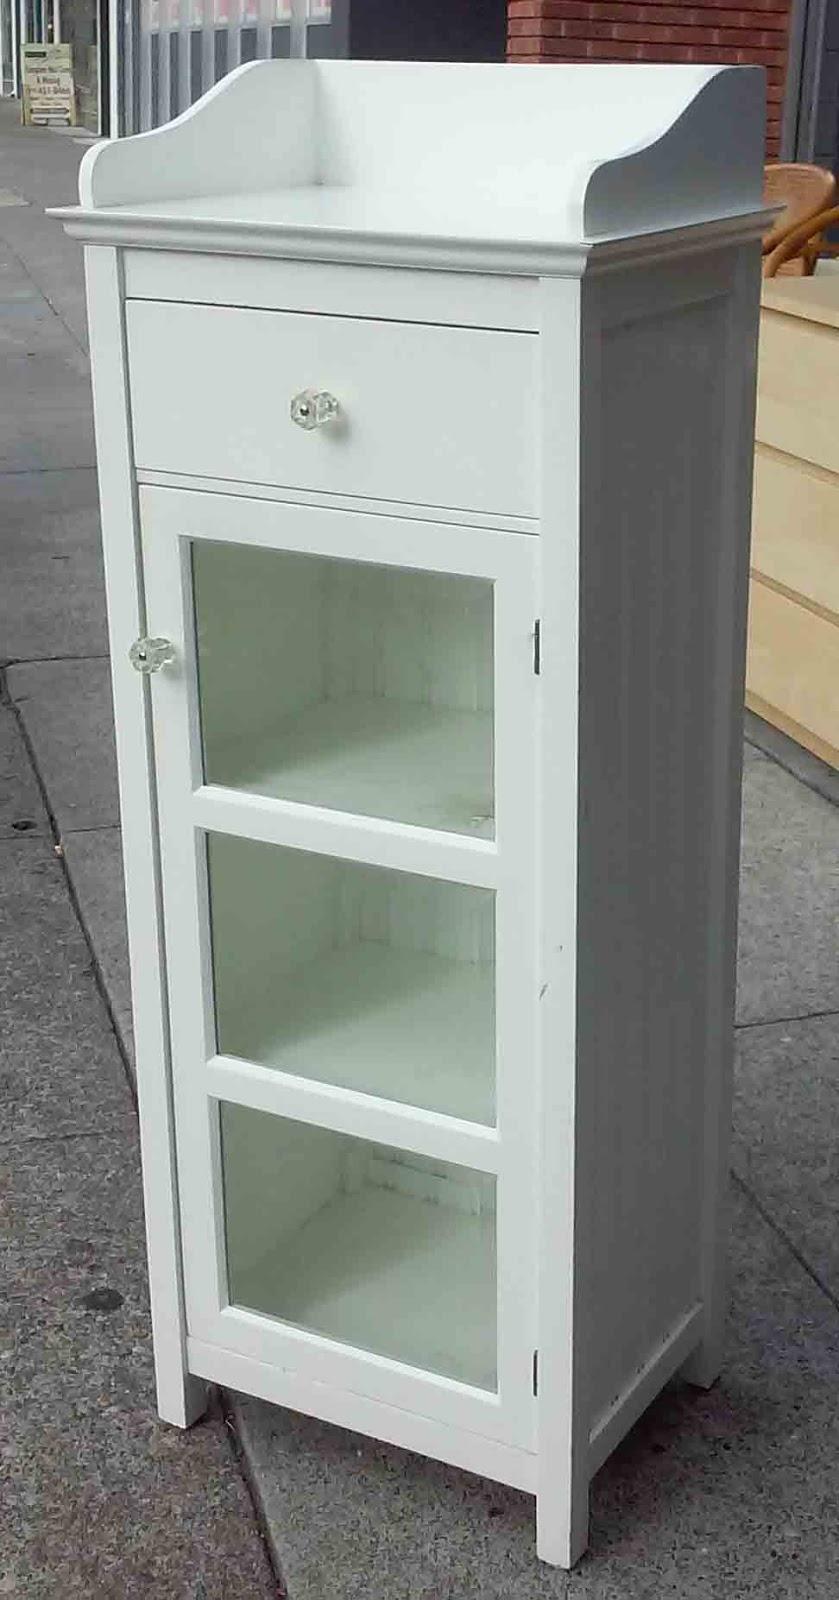 Uhuru Furniture Collectibles Sold Pottery Barn Bathroom Cabinet 95